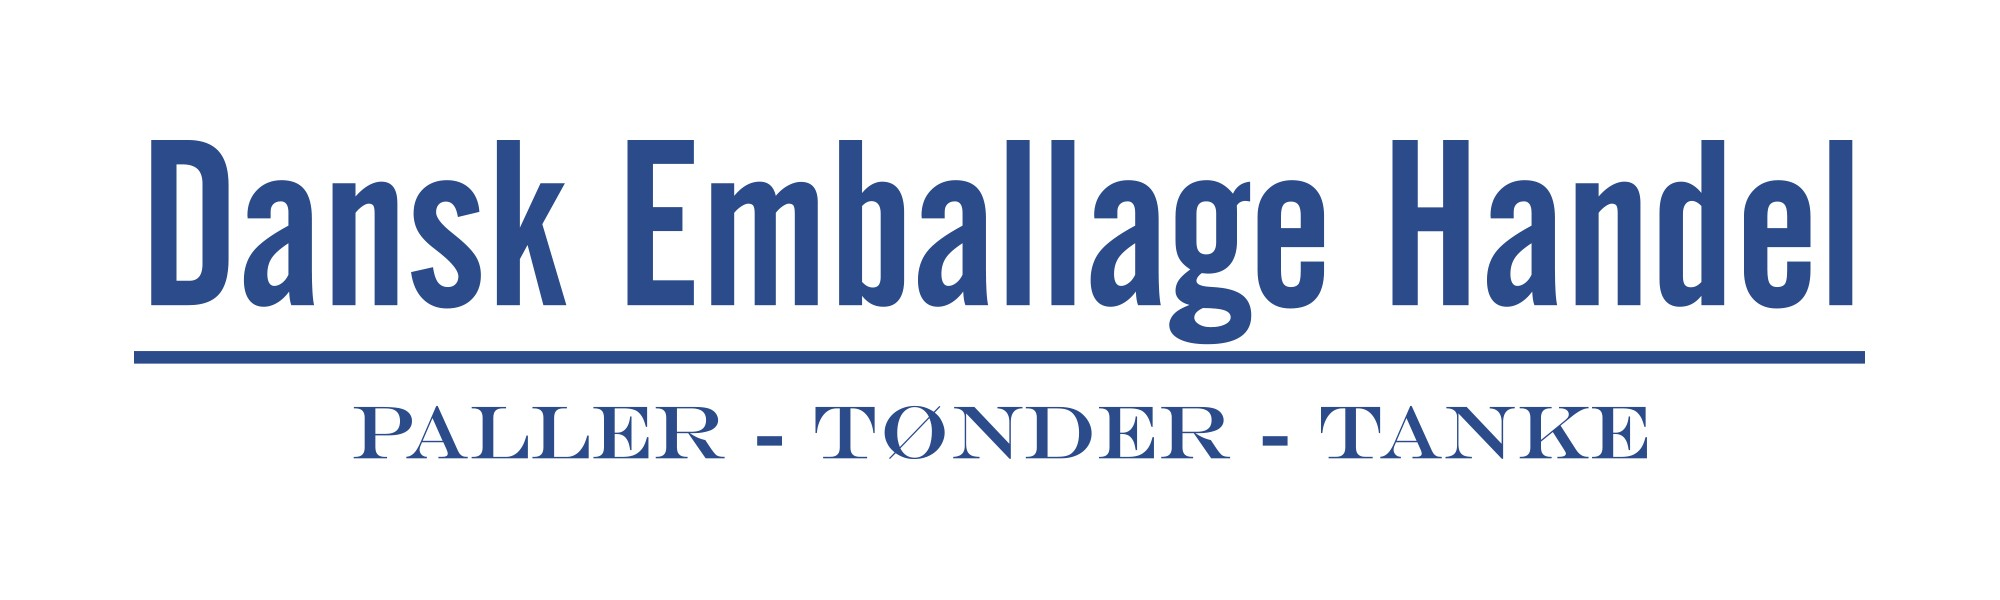 Dansk Emballage Handel